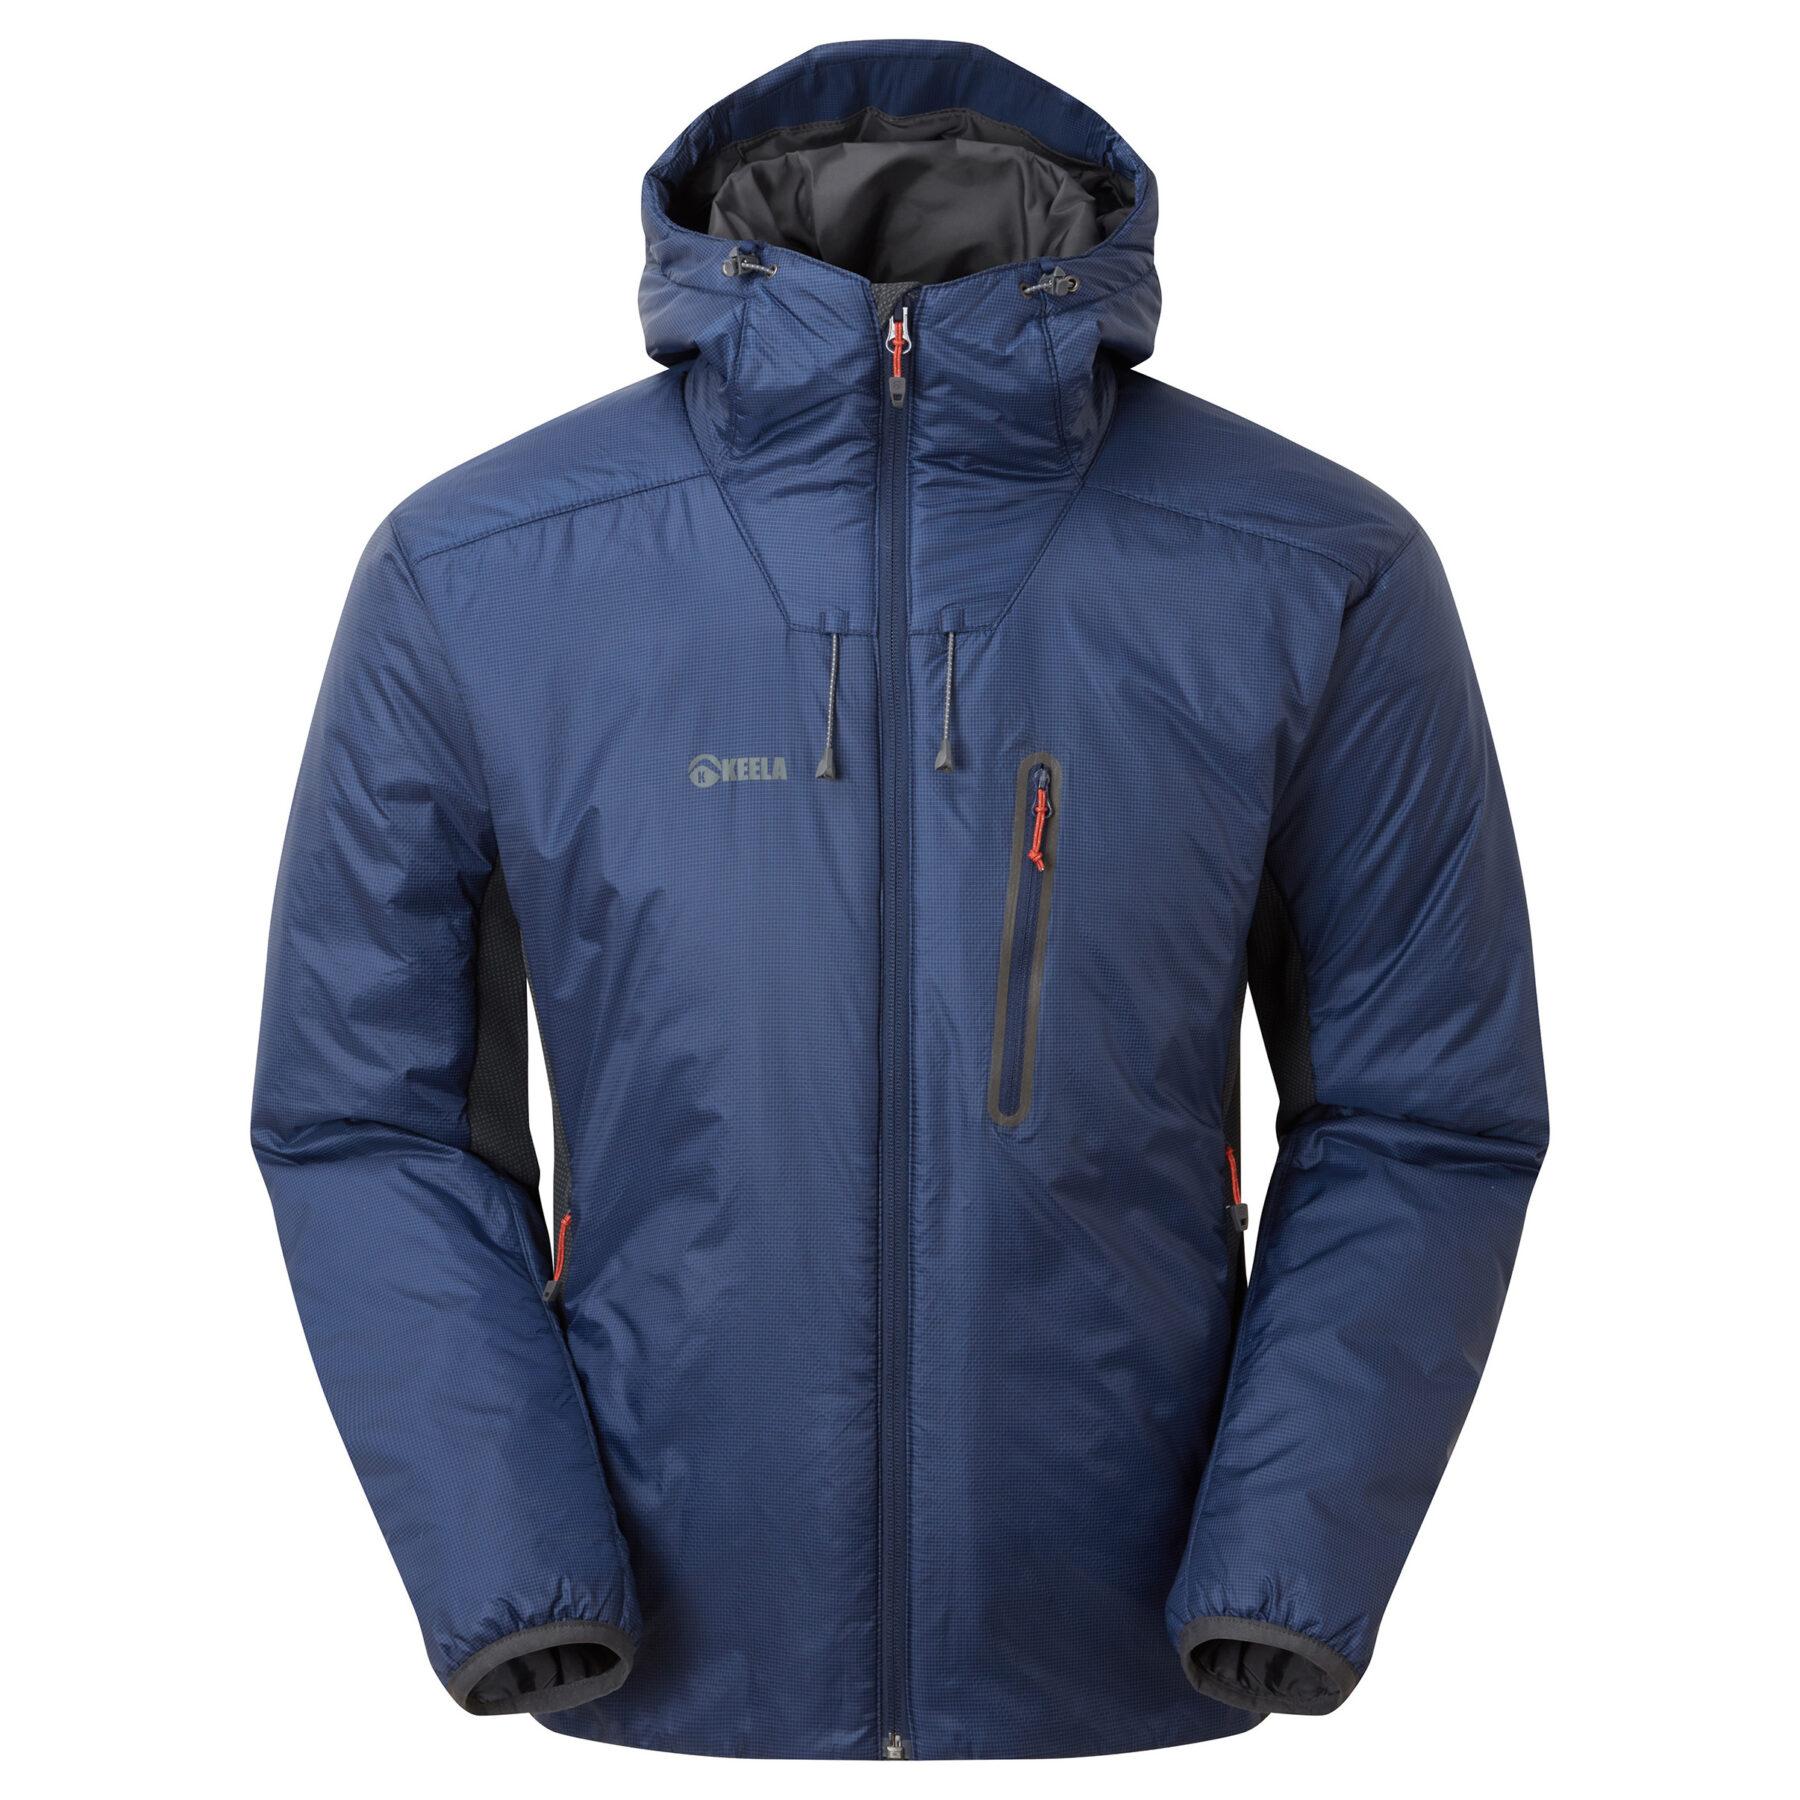 02310 Mens Talus Primaloft Jacket Deep Blue Front2